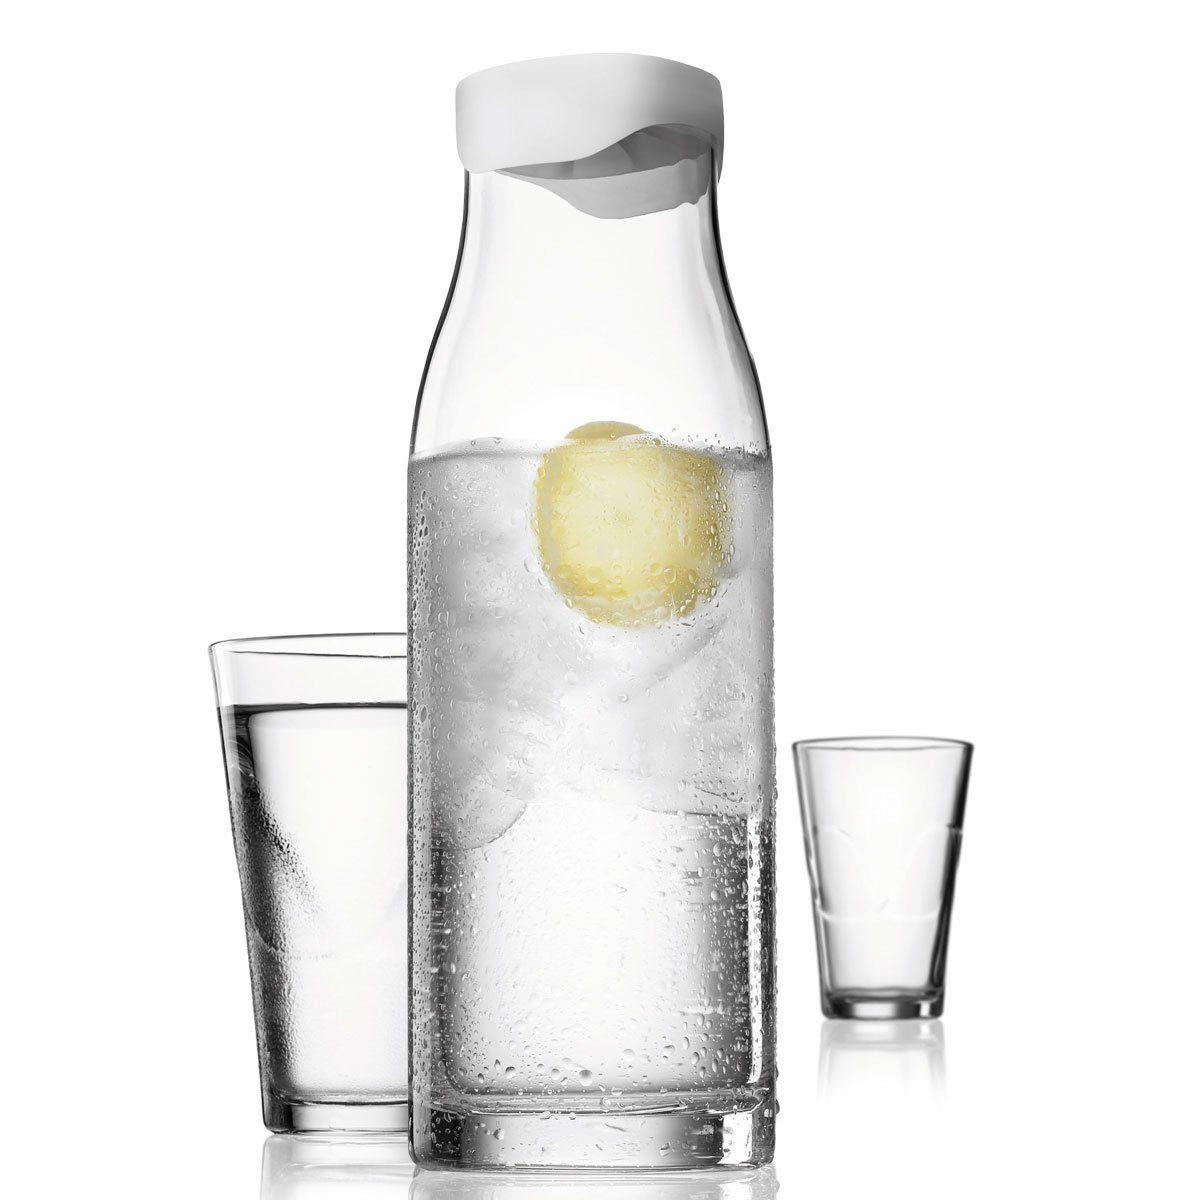 MENU Menu Set Karaffe 1L mit 2 Gläsern